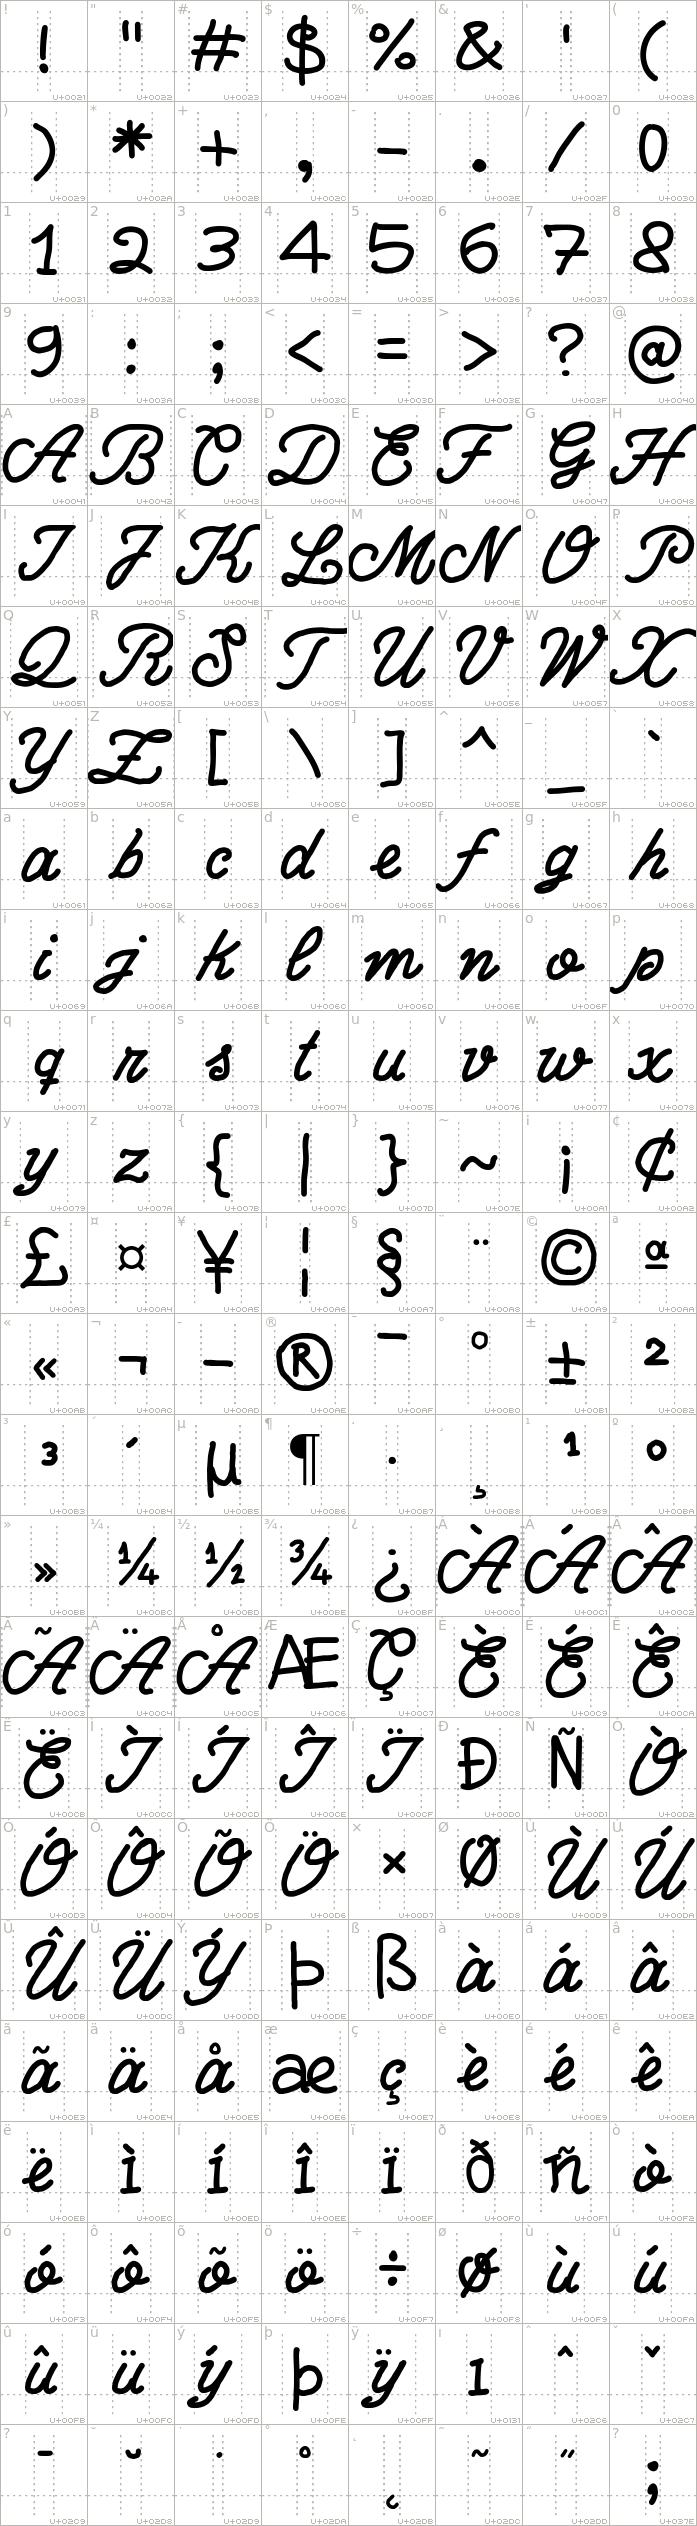 write-righ-script.regular.character-map-1